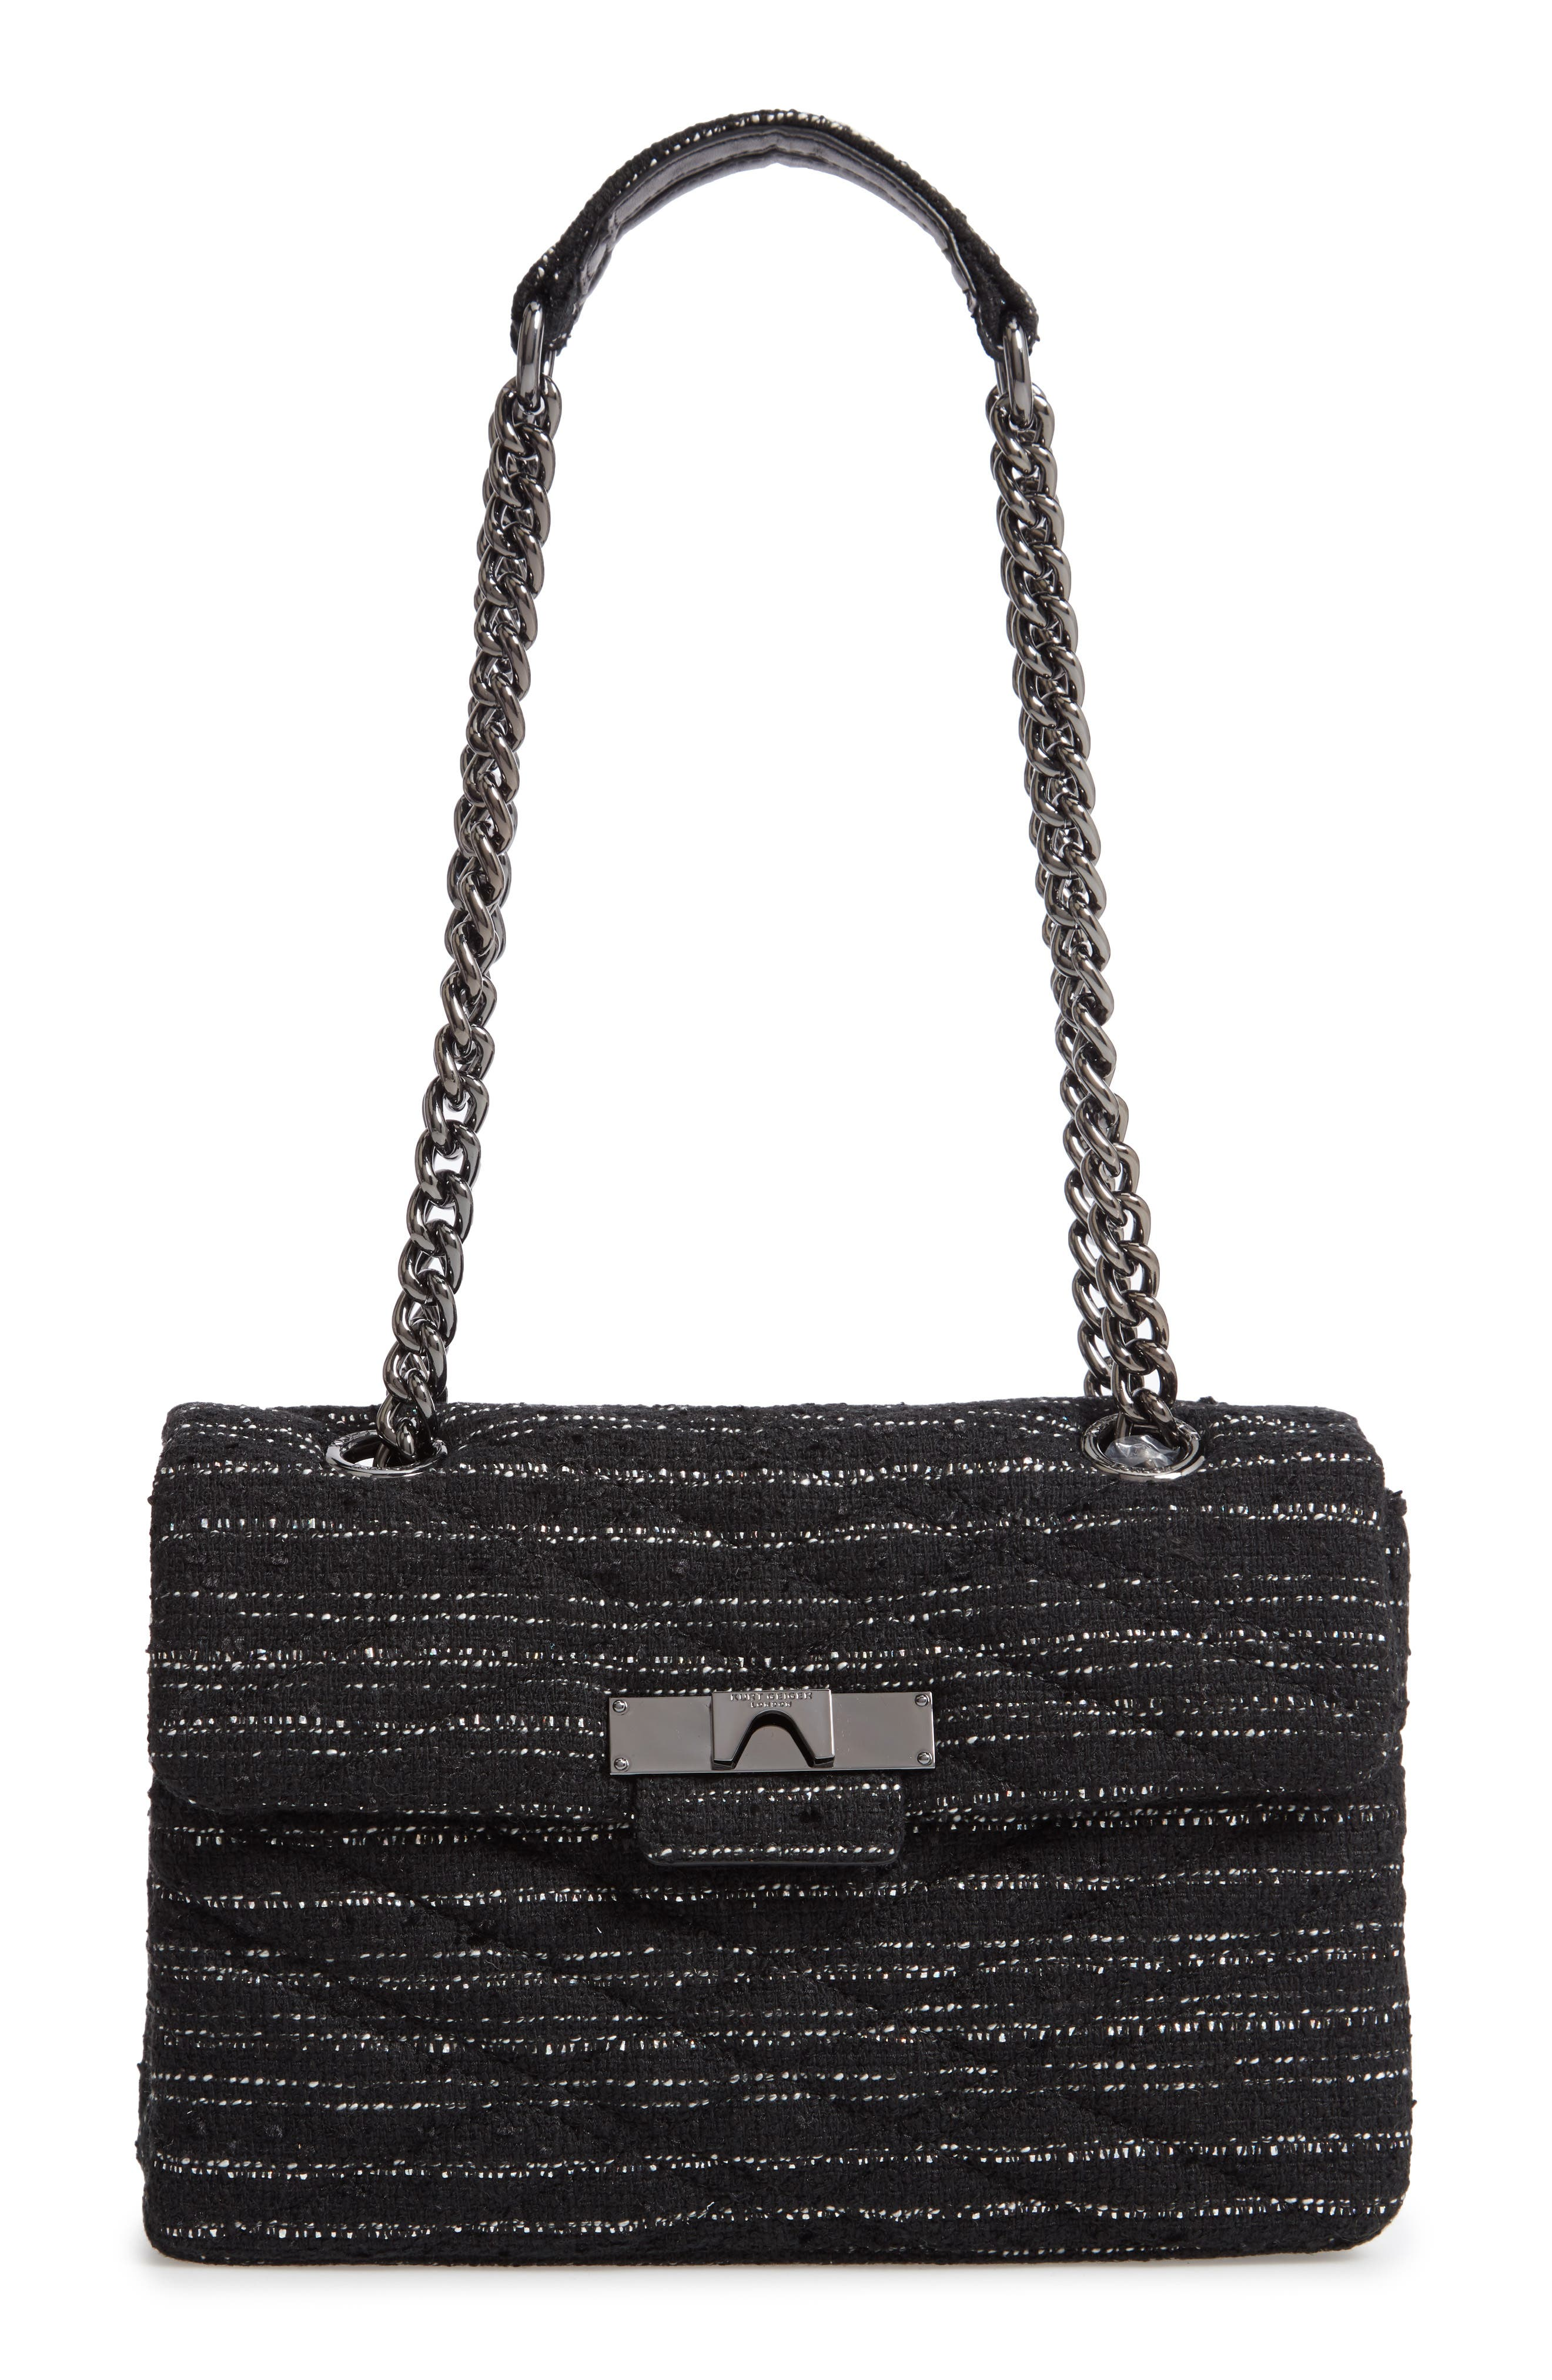 Mayfair Quilted Tweed Shoulder Bag,                         Main,                         color, BLACK